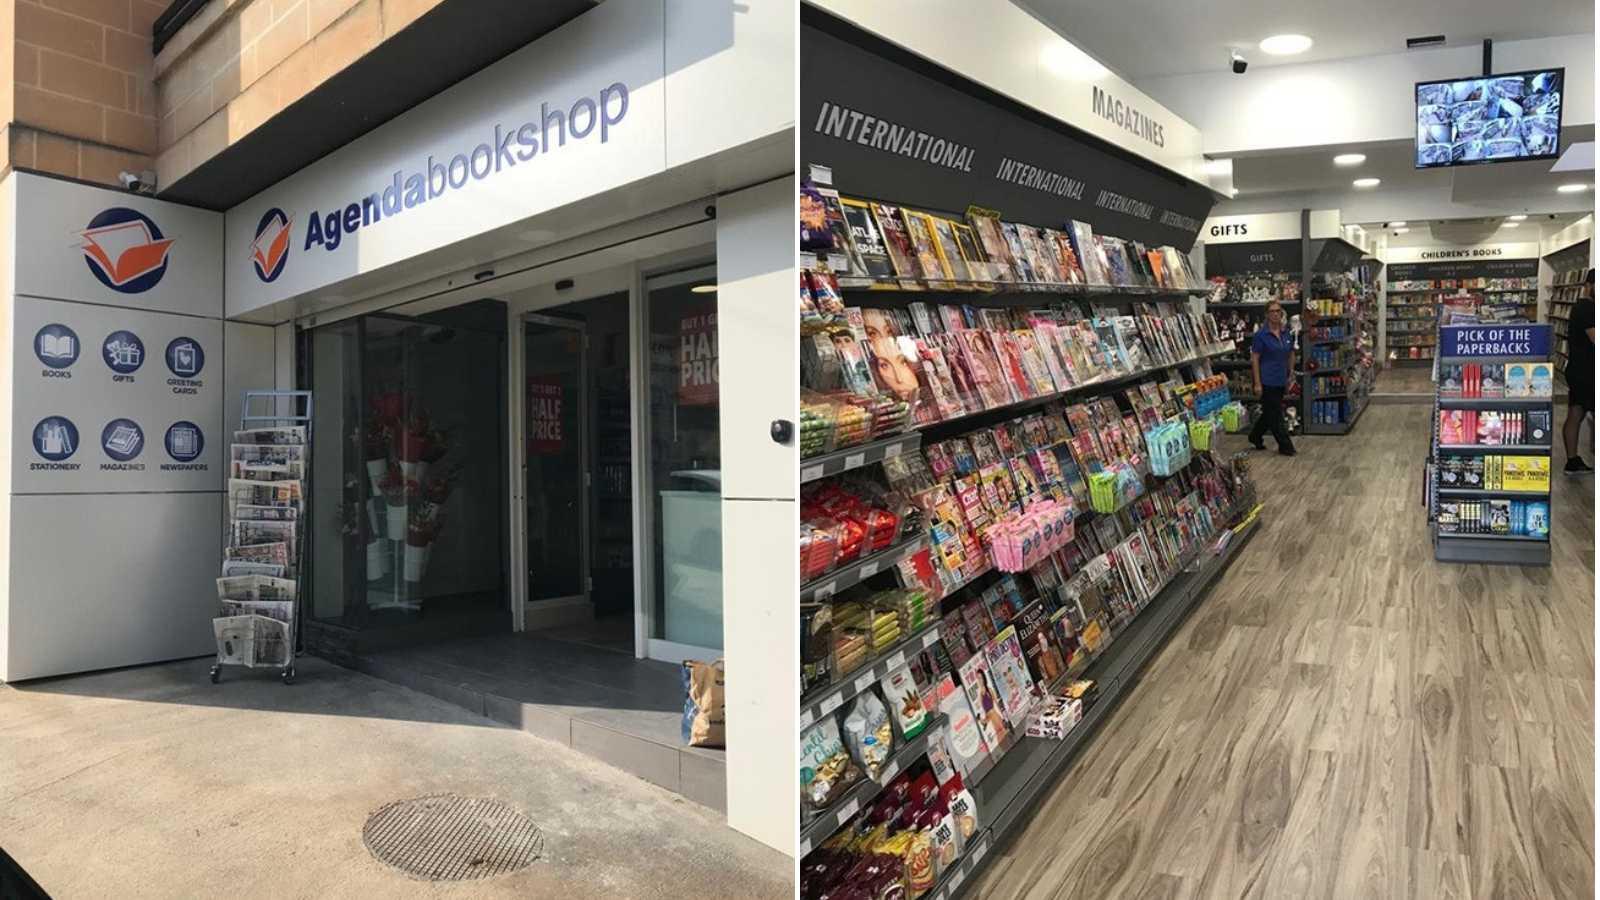 Agenda Bookshop at Topline Megastore now relocated to Ibraġġ